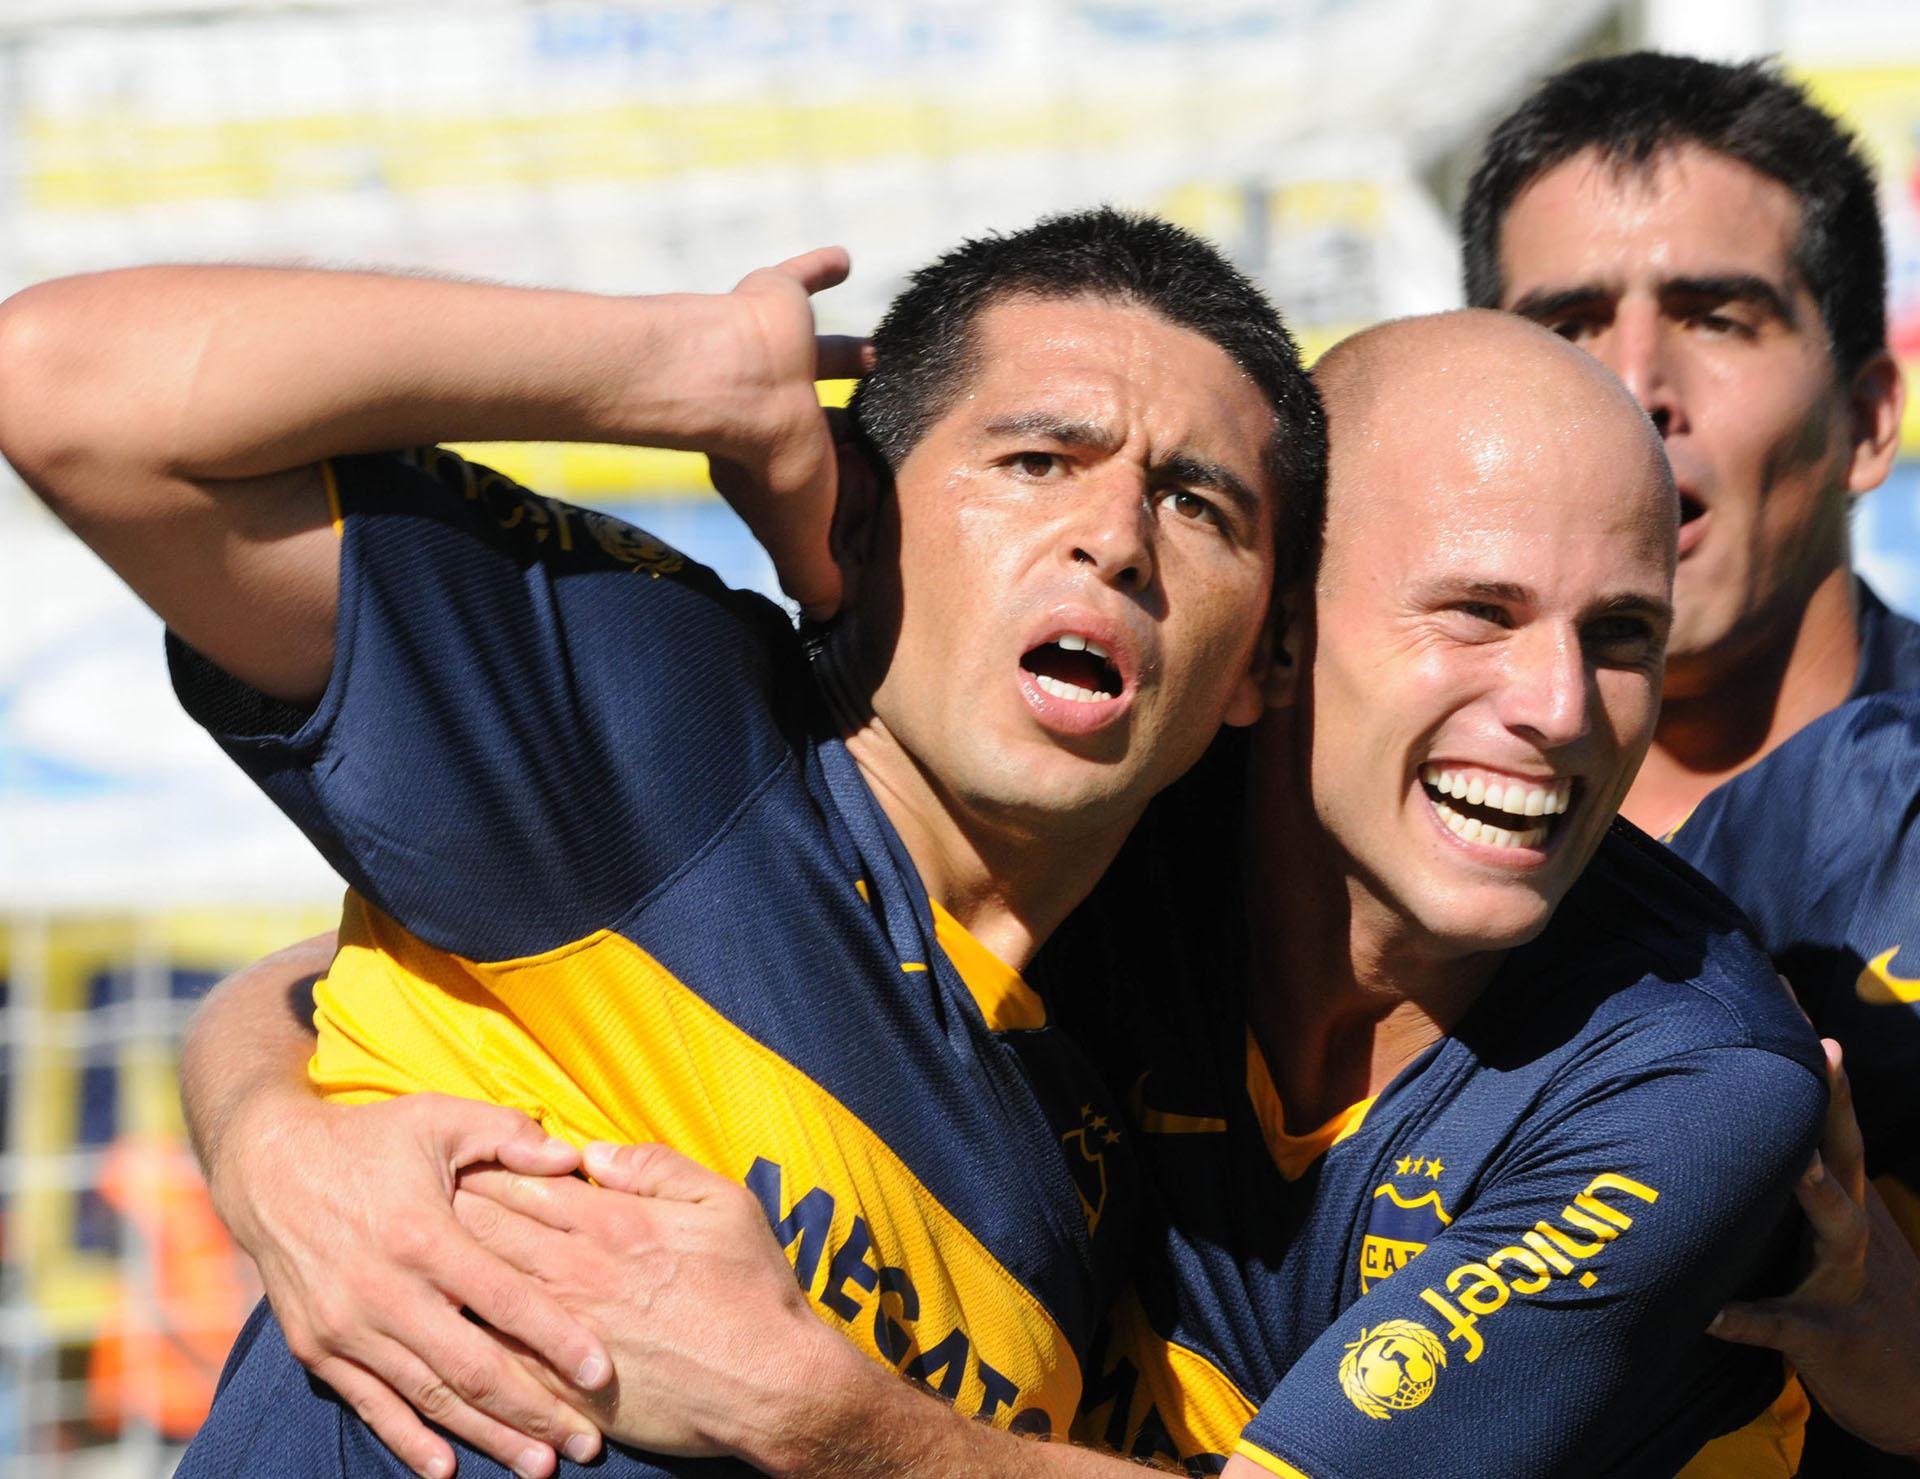 Román firmó casi 100 goles con la camiseta de Boca (NA)